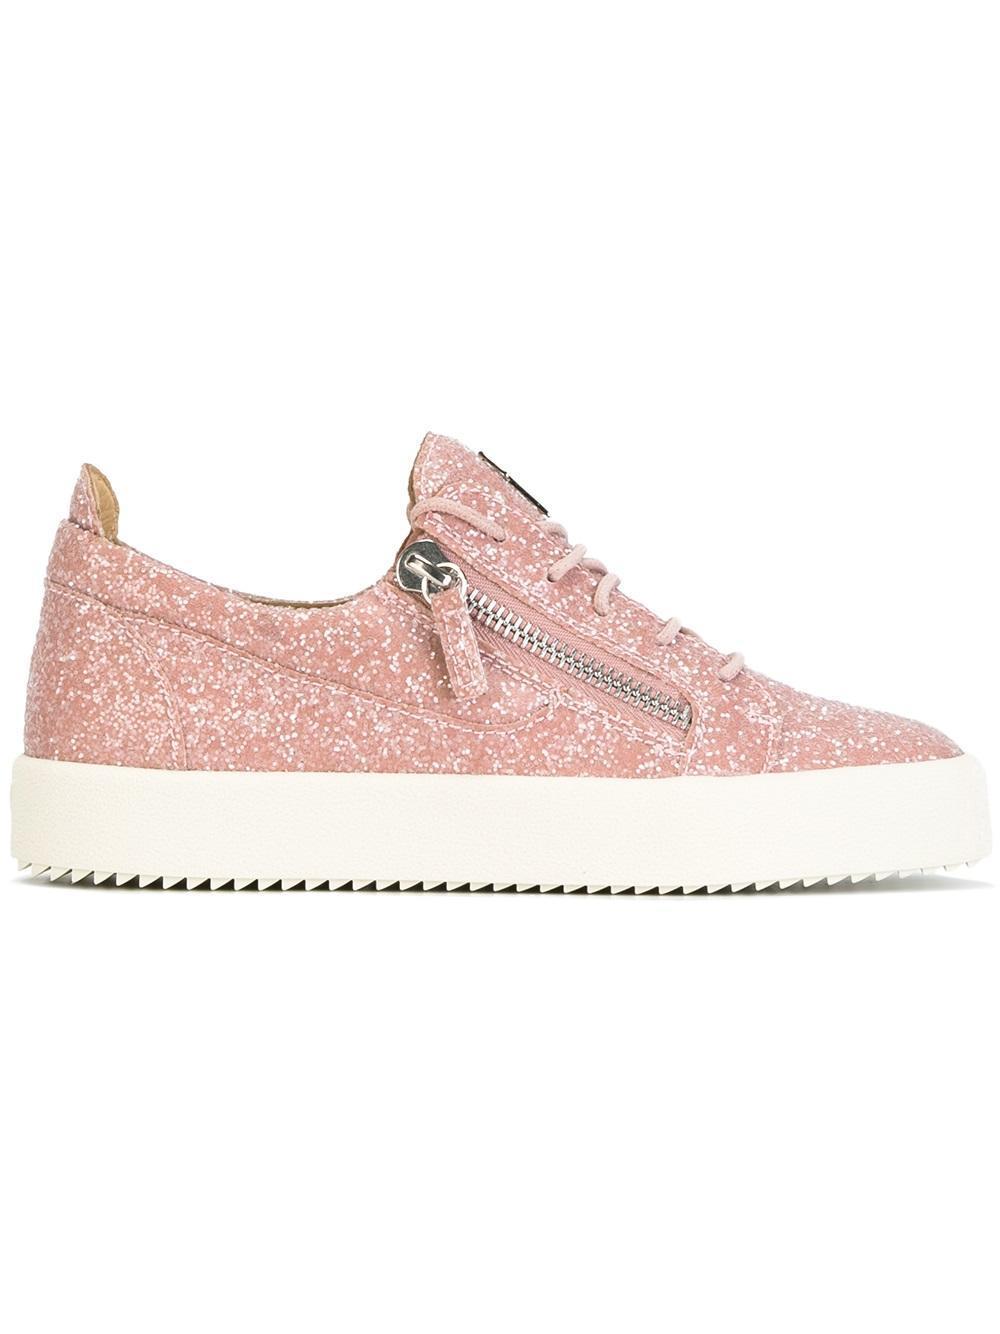 7429371375036 Giuseppe Zanotti 'cheryl' Glitter Sneakers in Pink - Lyst